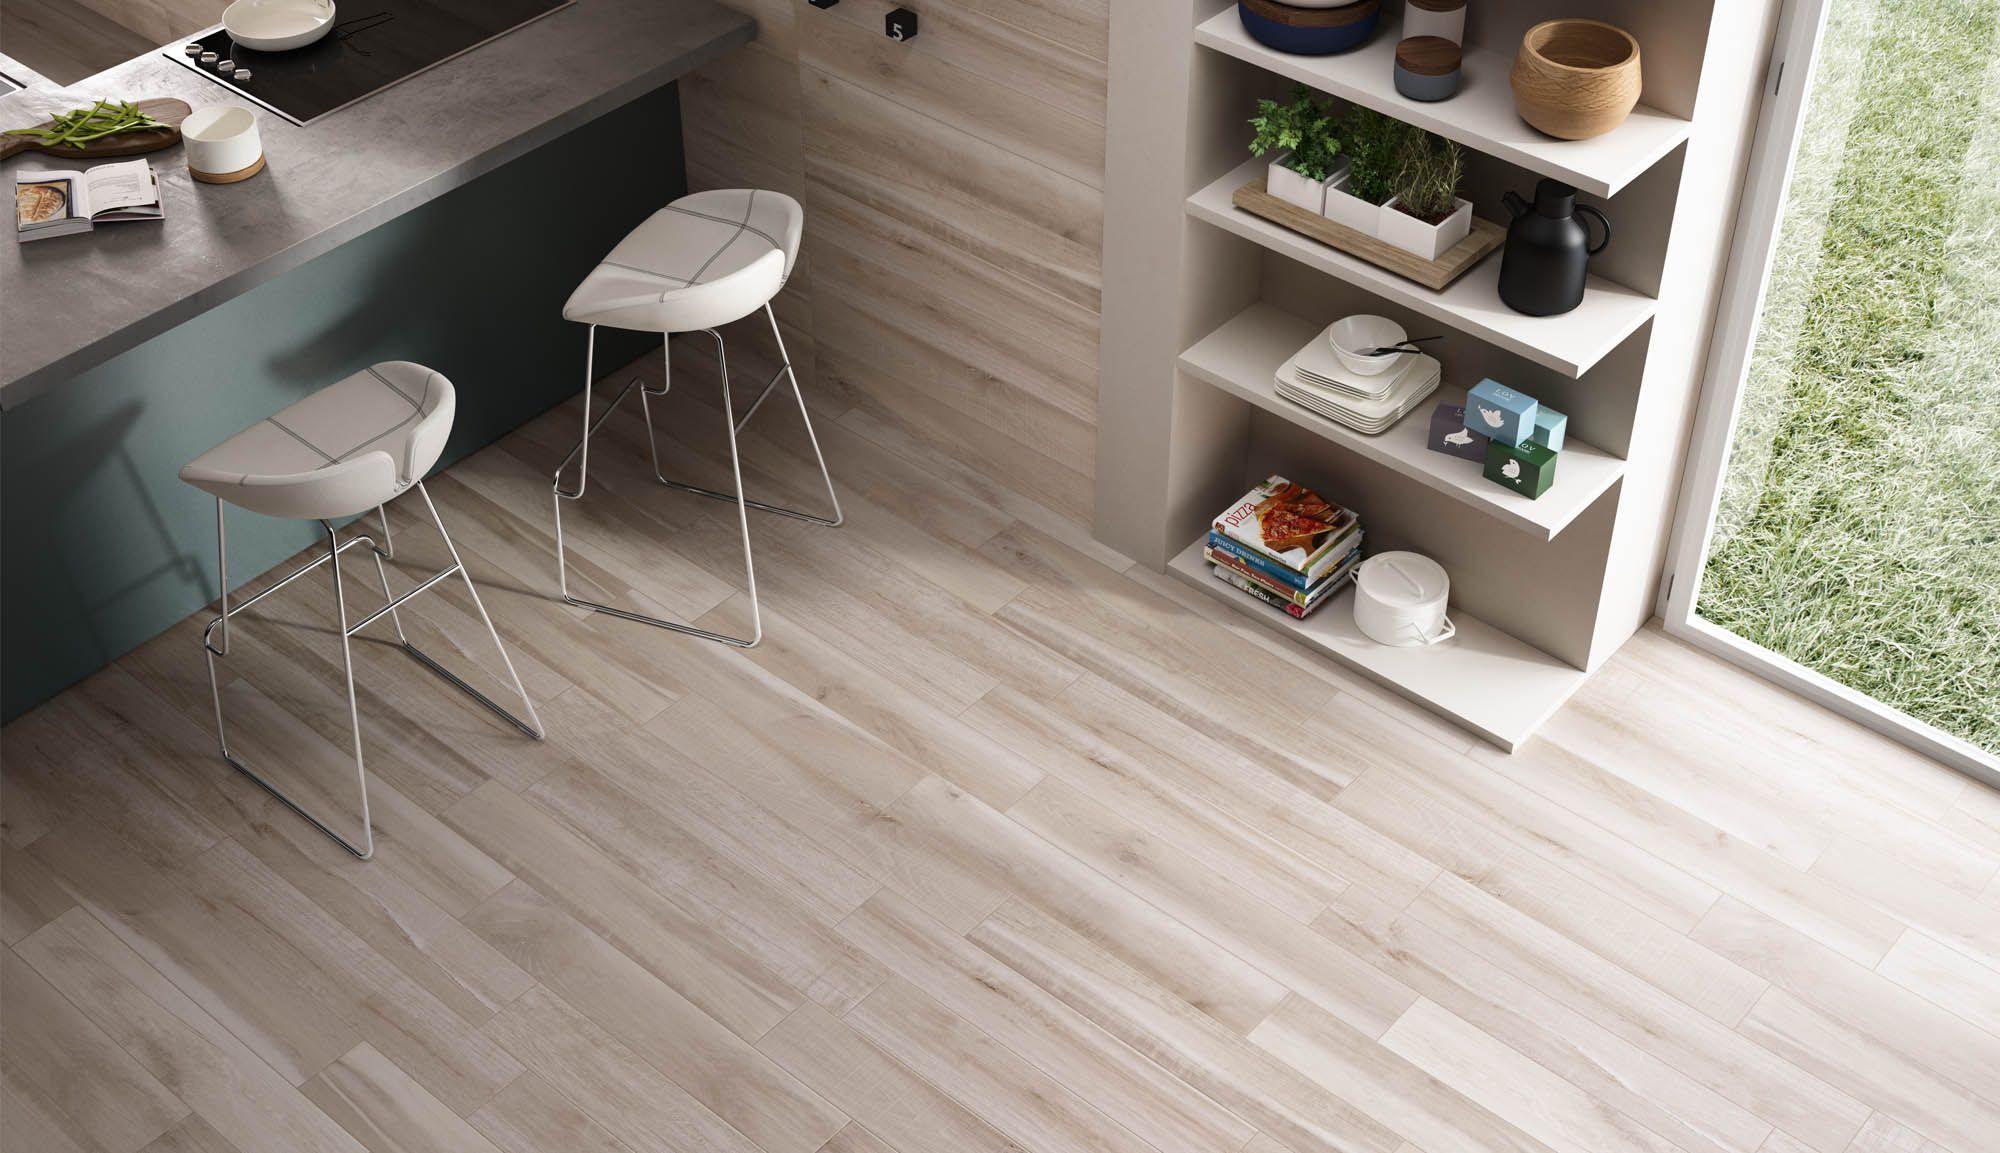 Wood Look Tile Eccellenza Floors And Tiles Floors In Orlando Wood Look Tile Kitchen Tiles Backsplash Flooring Store